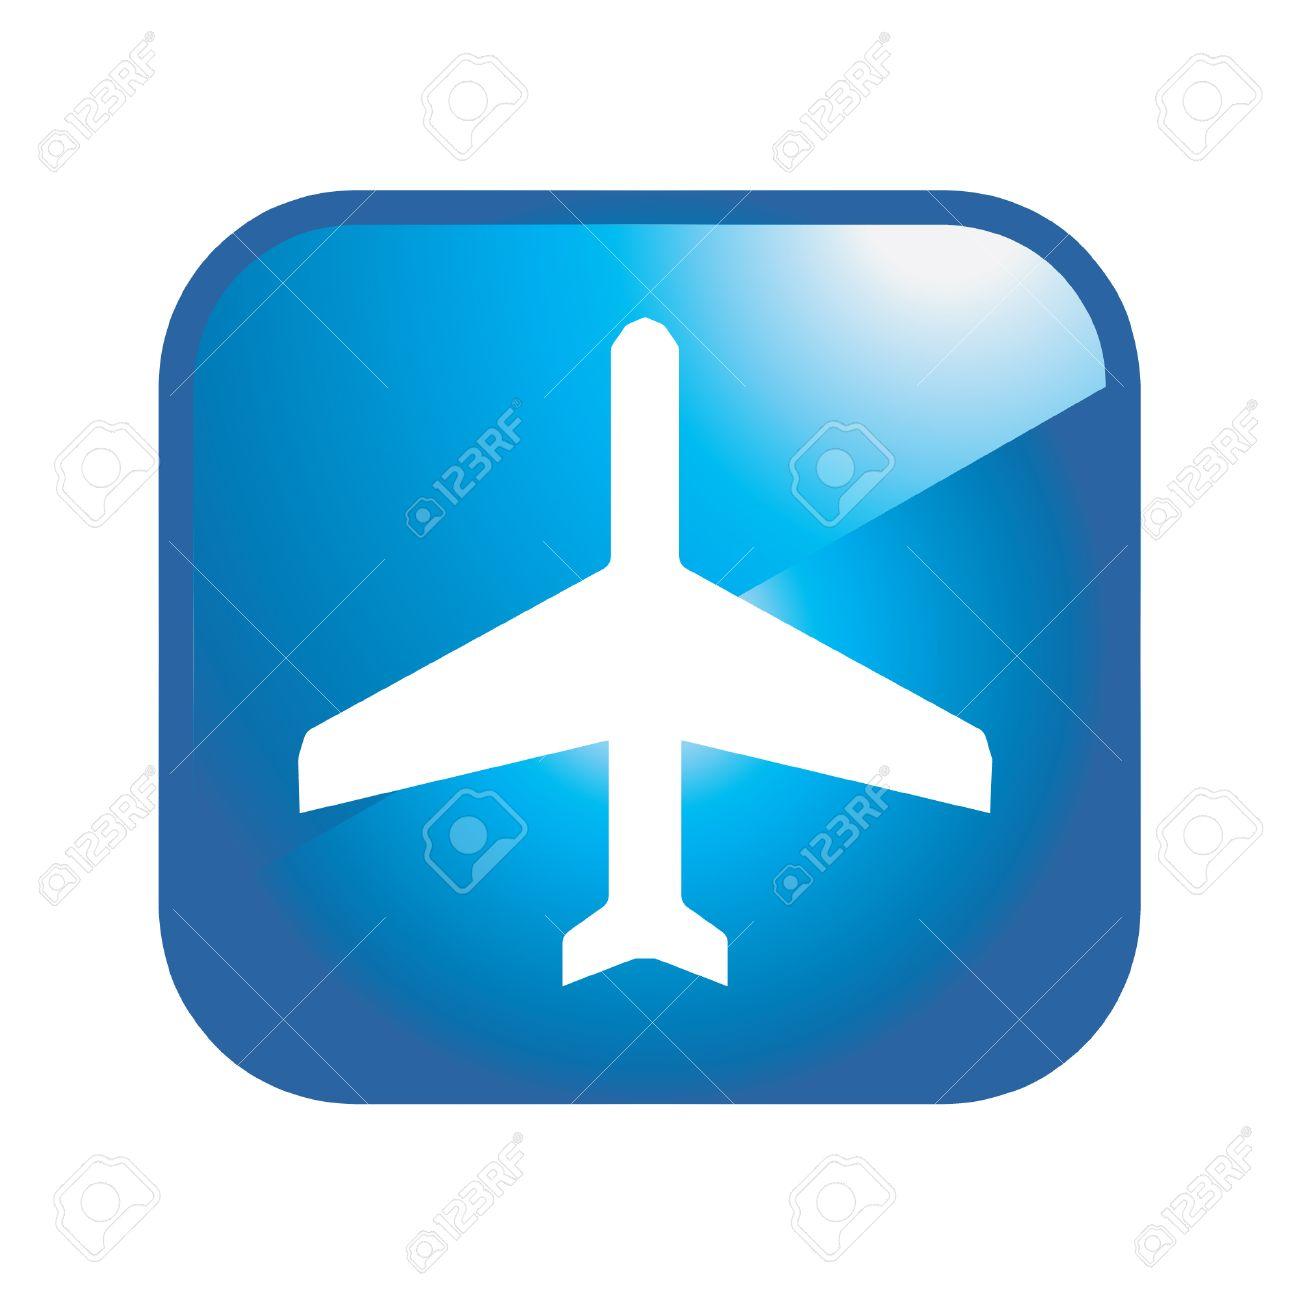 airplane icon Stock Vector - 8883473